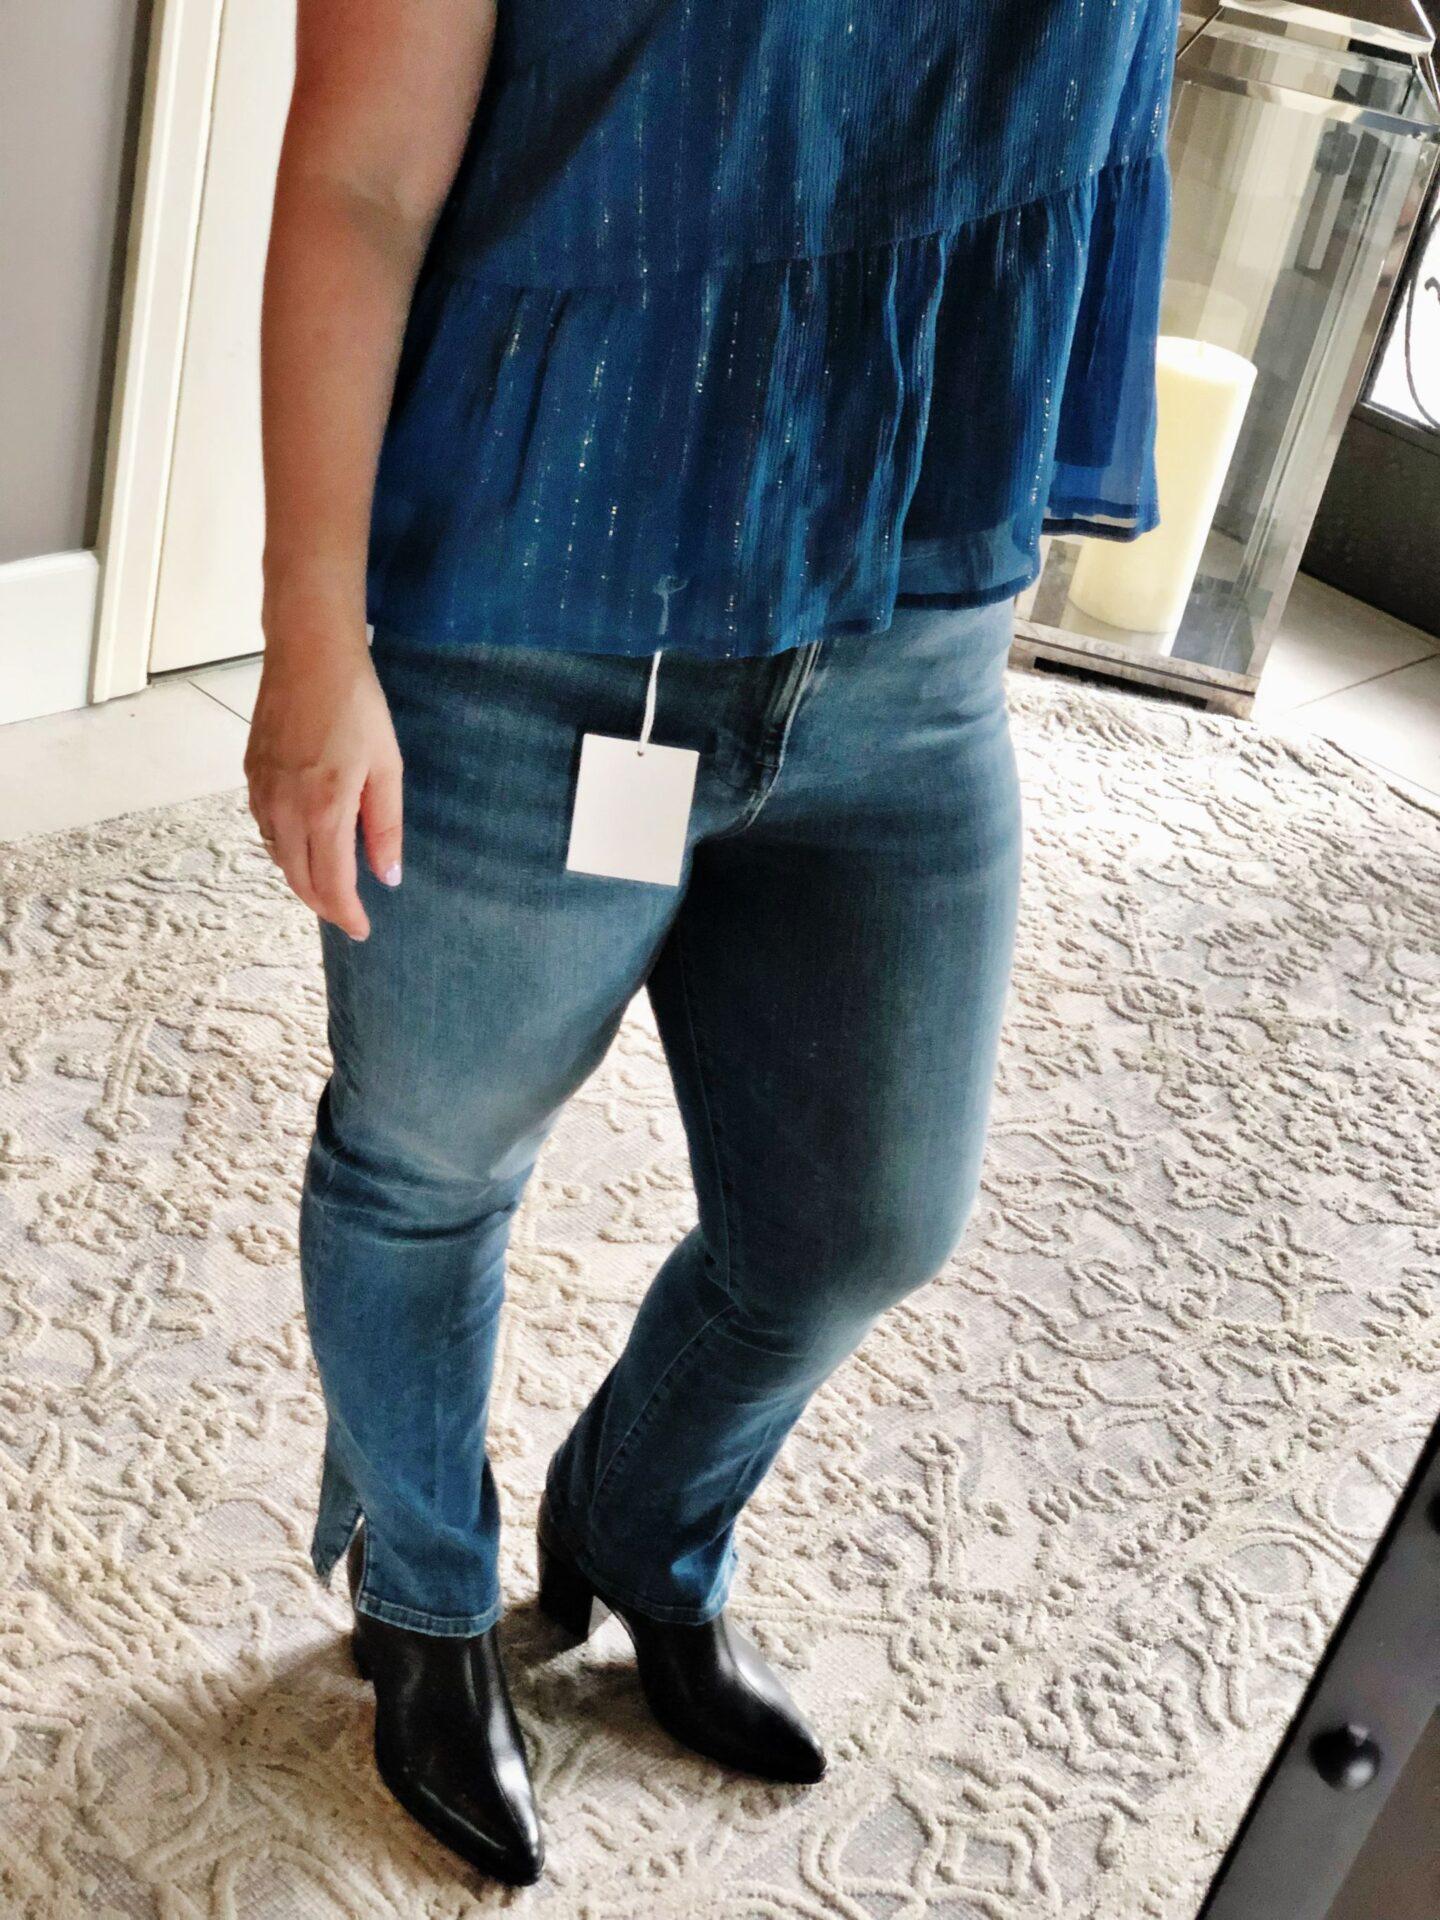 Nordstrom Anniversary Sale 2019 | Frame Le High Straight Slit Hem Ankle Jean, Vince Havana Notched Bootie